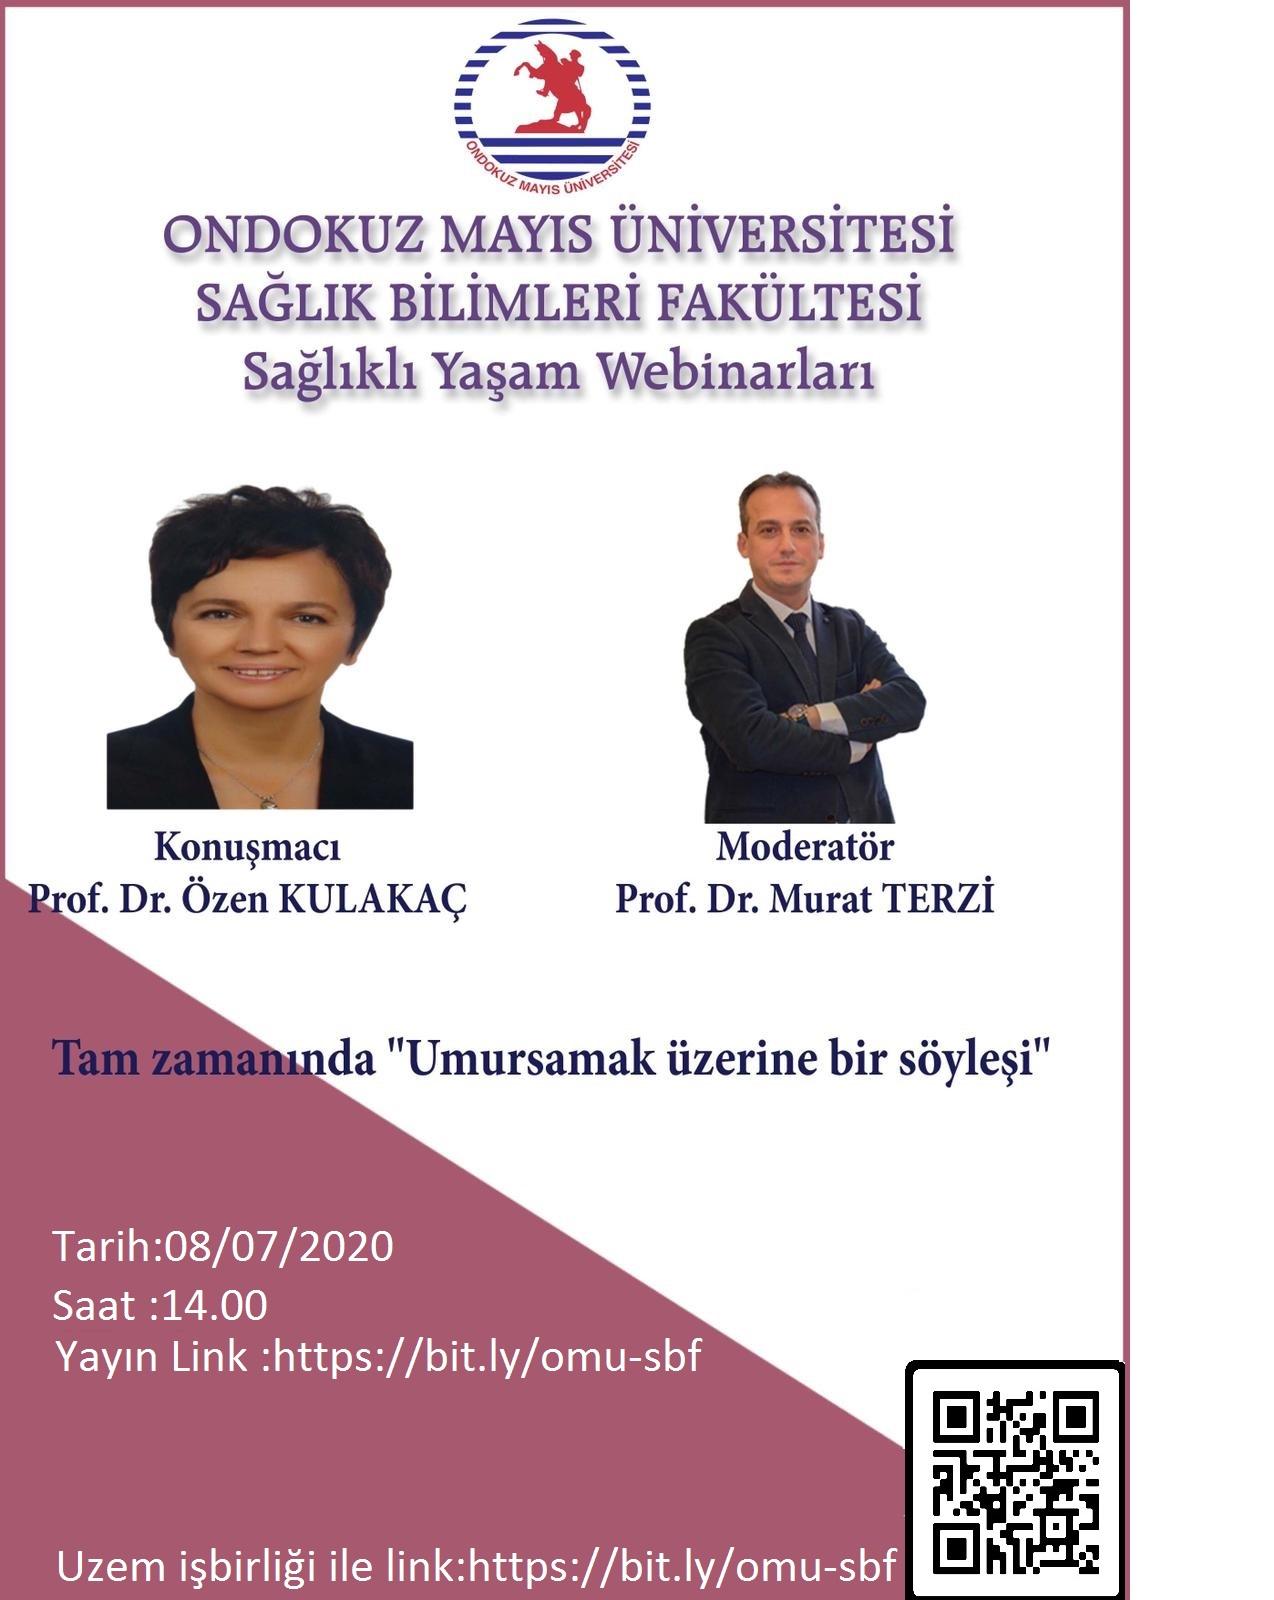 http://www.omu.edu.tr/sites/default/files/omu_saglikli_yasam_webinarlari.jpg